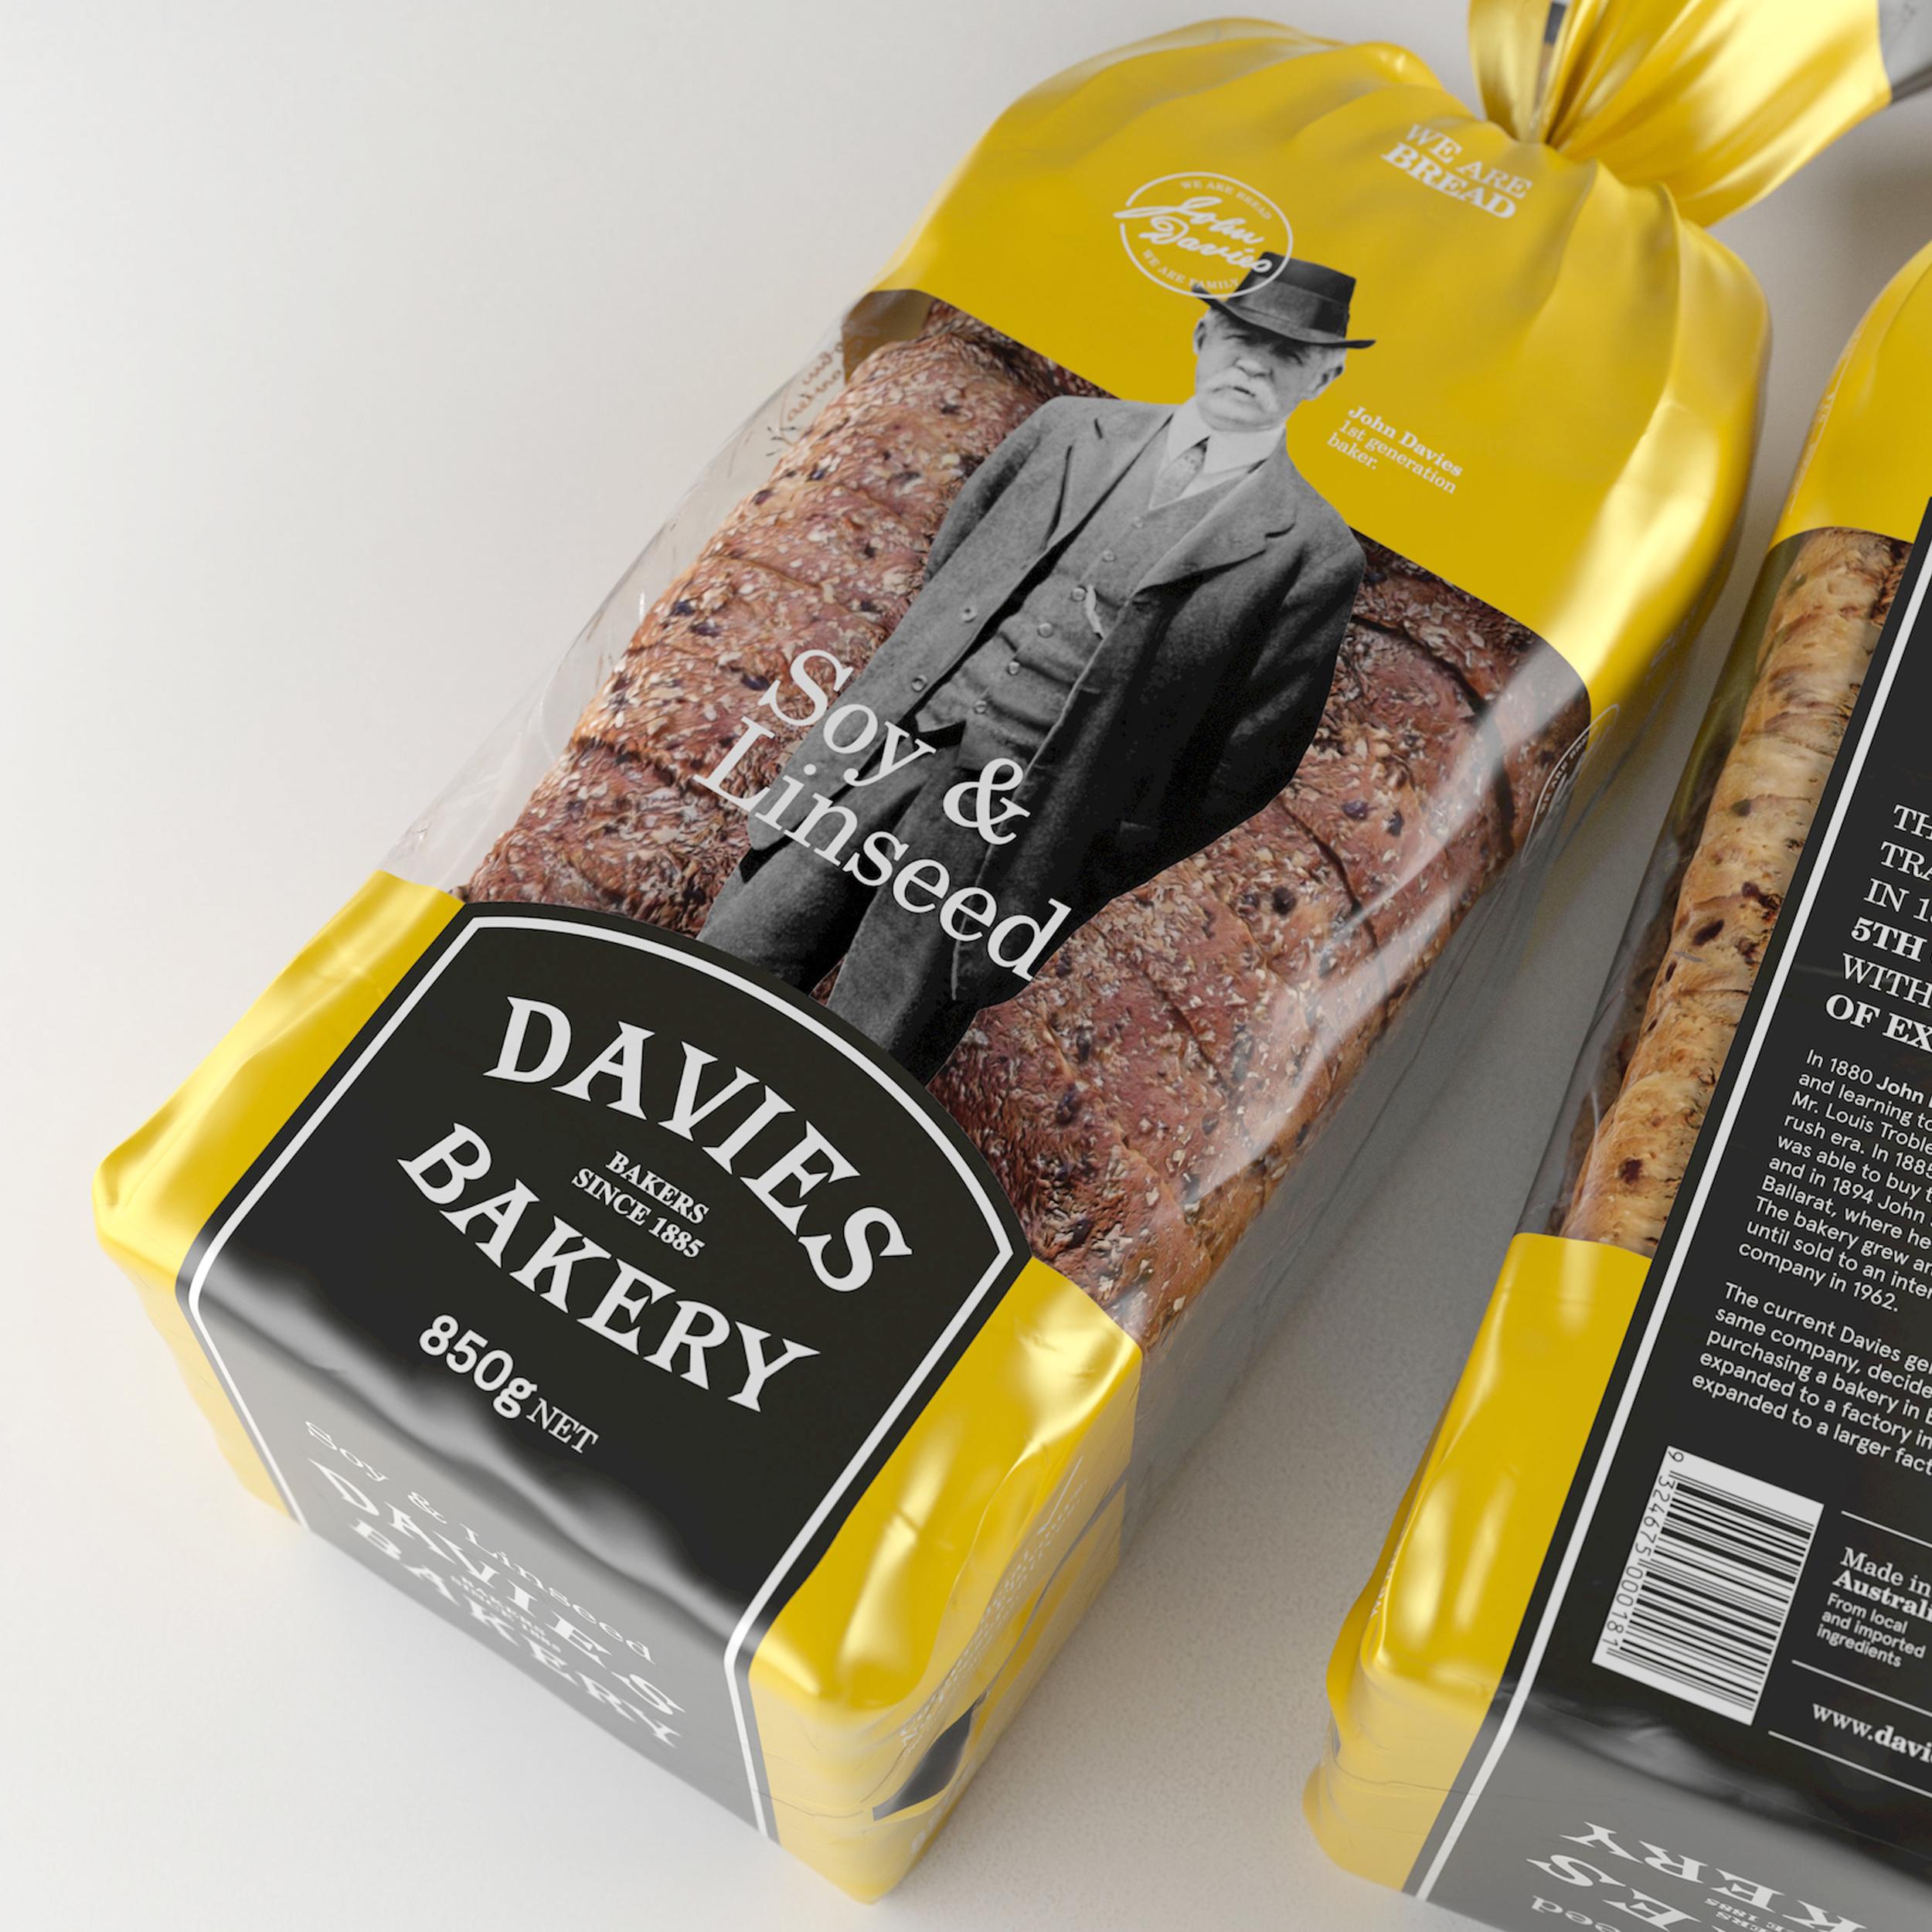 Davies Bakery  Packaging